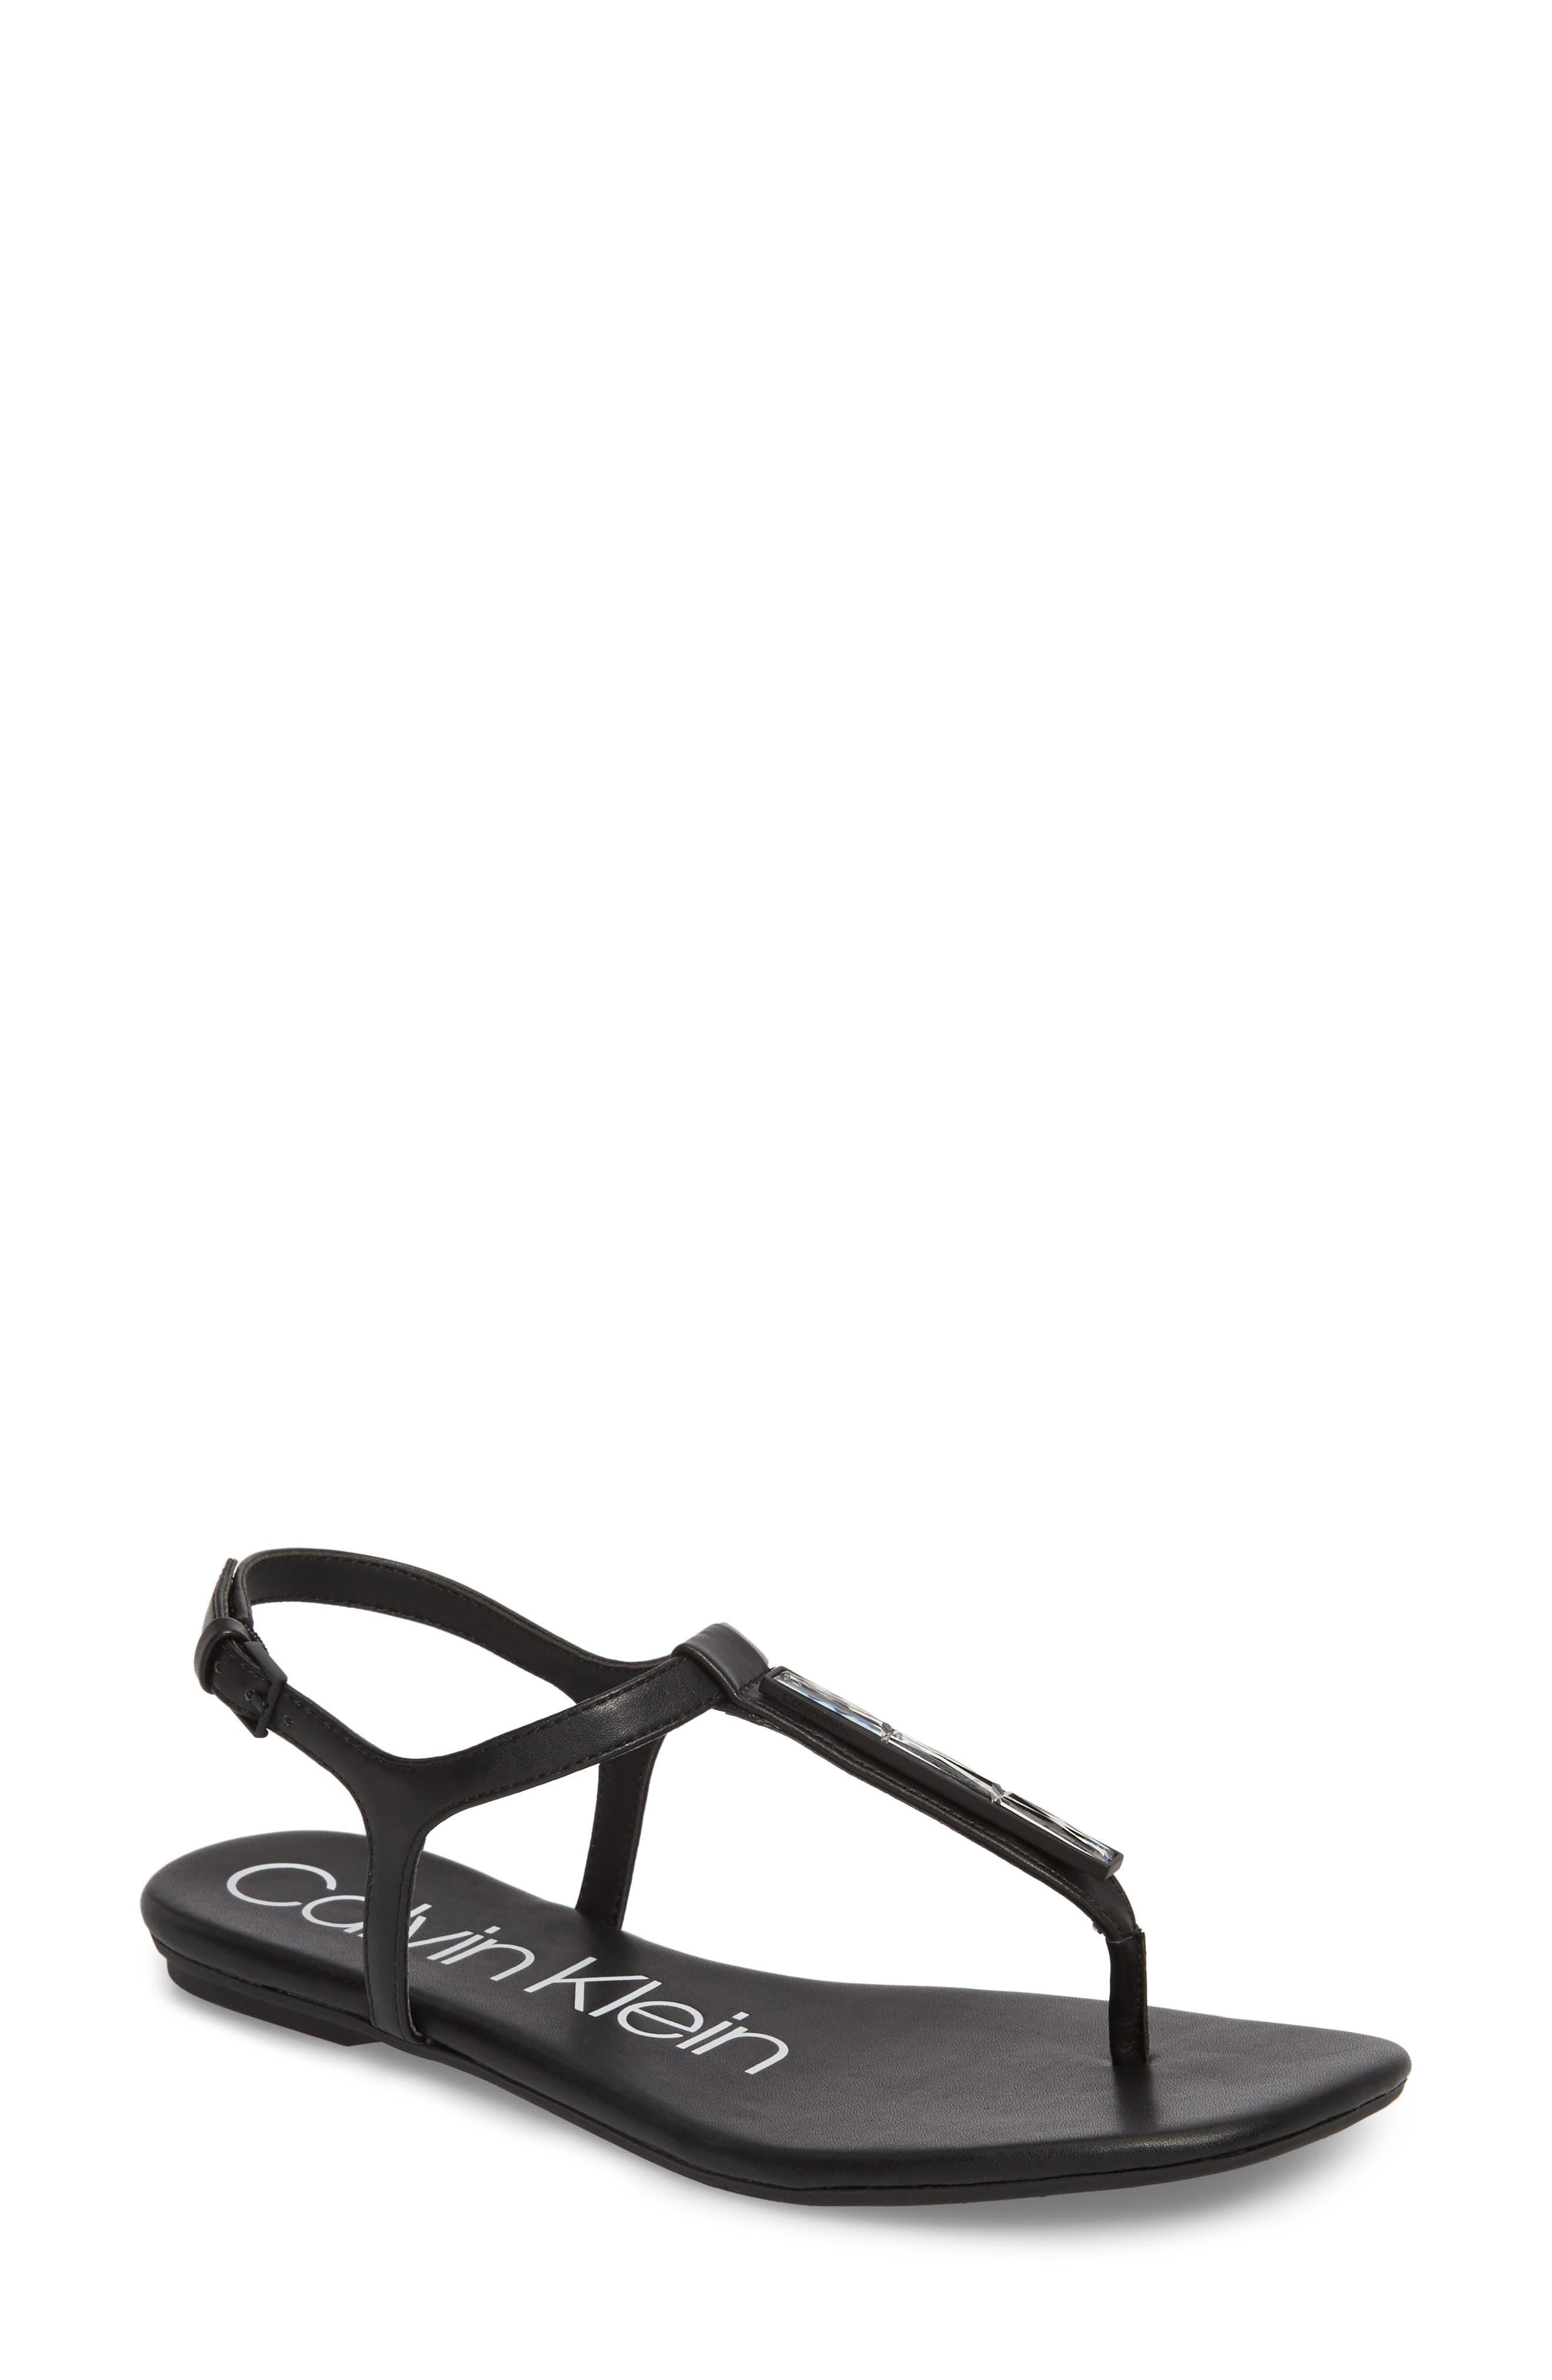 CALVIN KLEIN Sharene Sandal, Main, color, 001